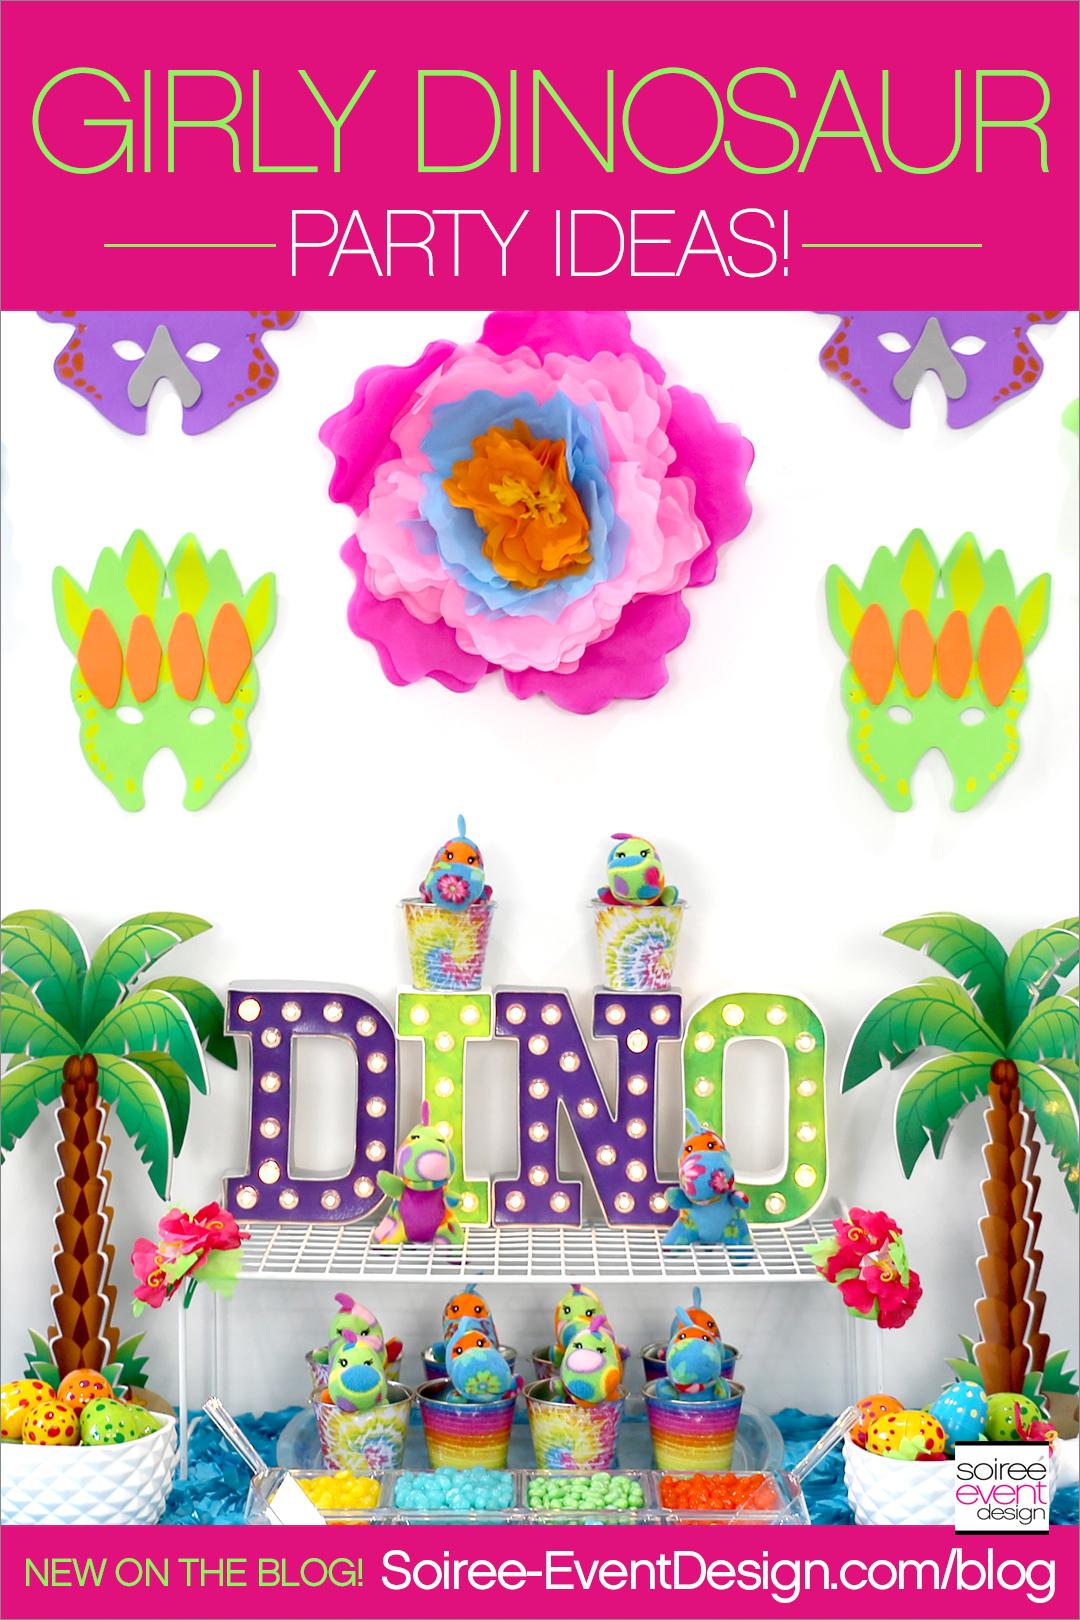 Girly Dinosaur Party Ideas